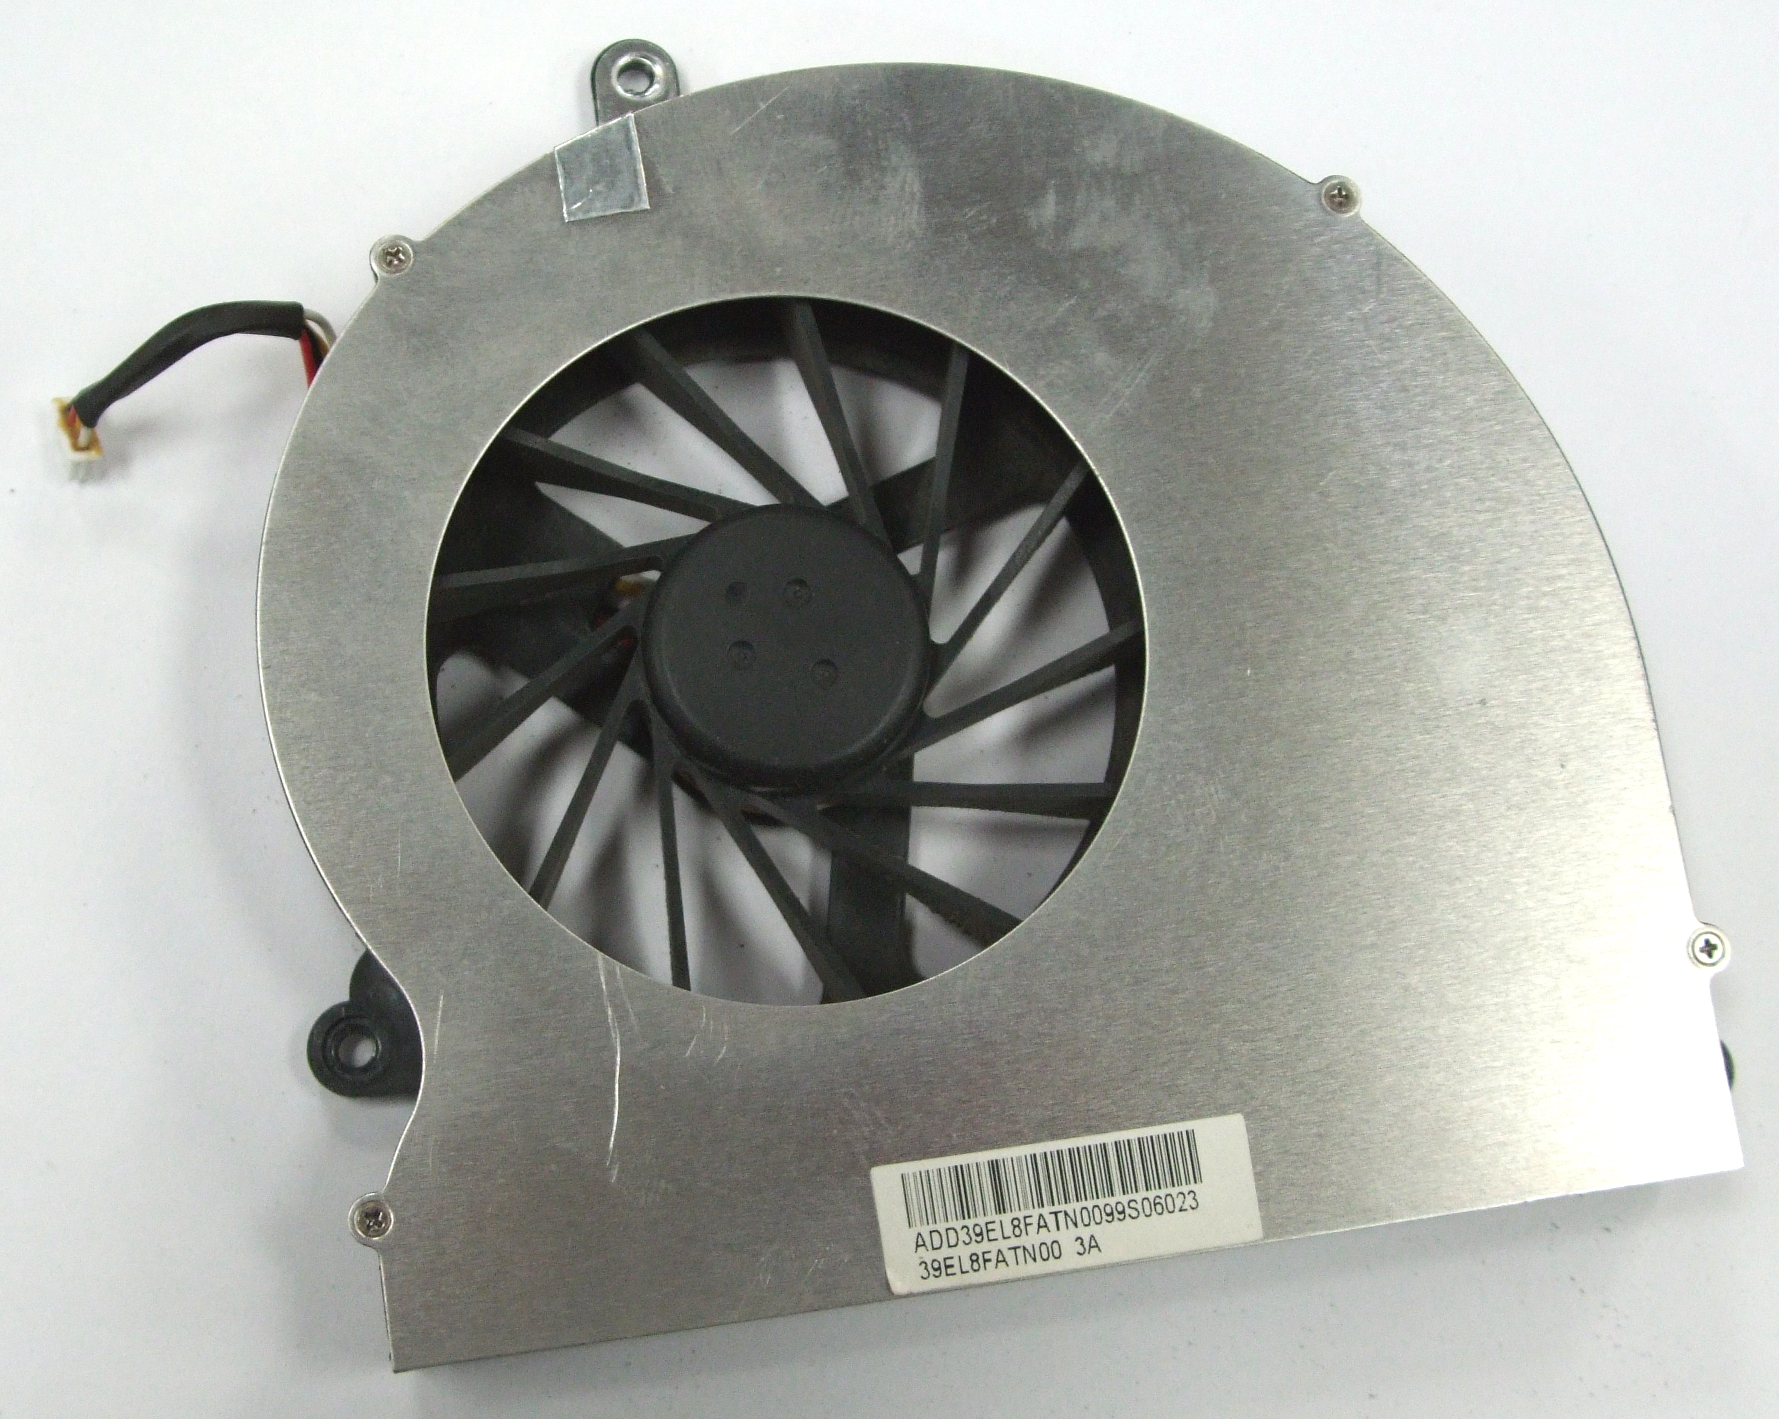 39EL8FATN00 Adda 12V 0.30A Fan Assembly - AB1212HX-PBB